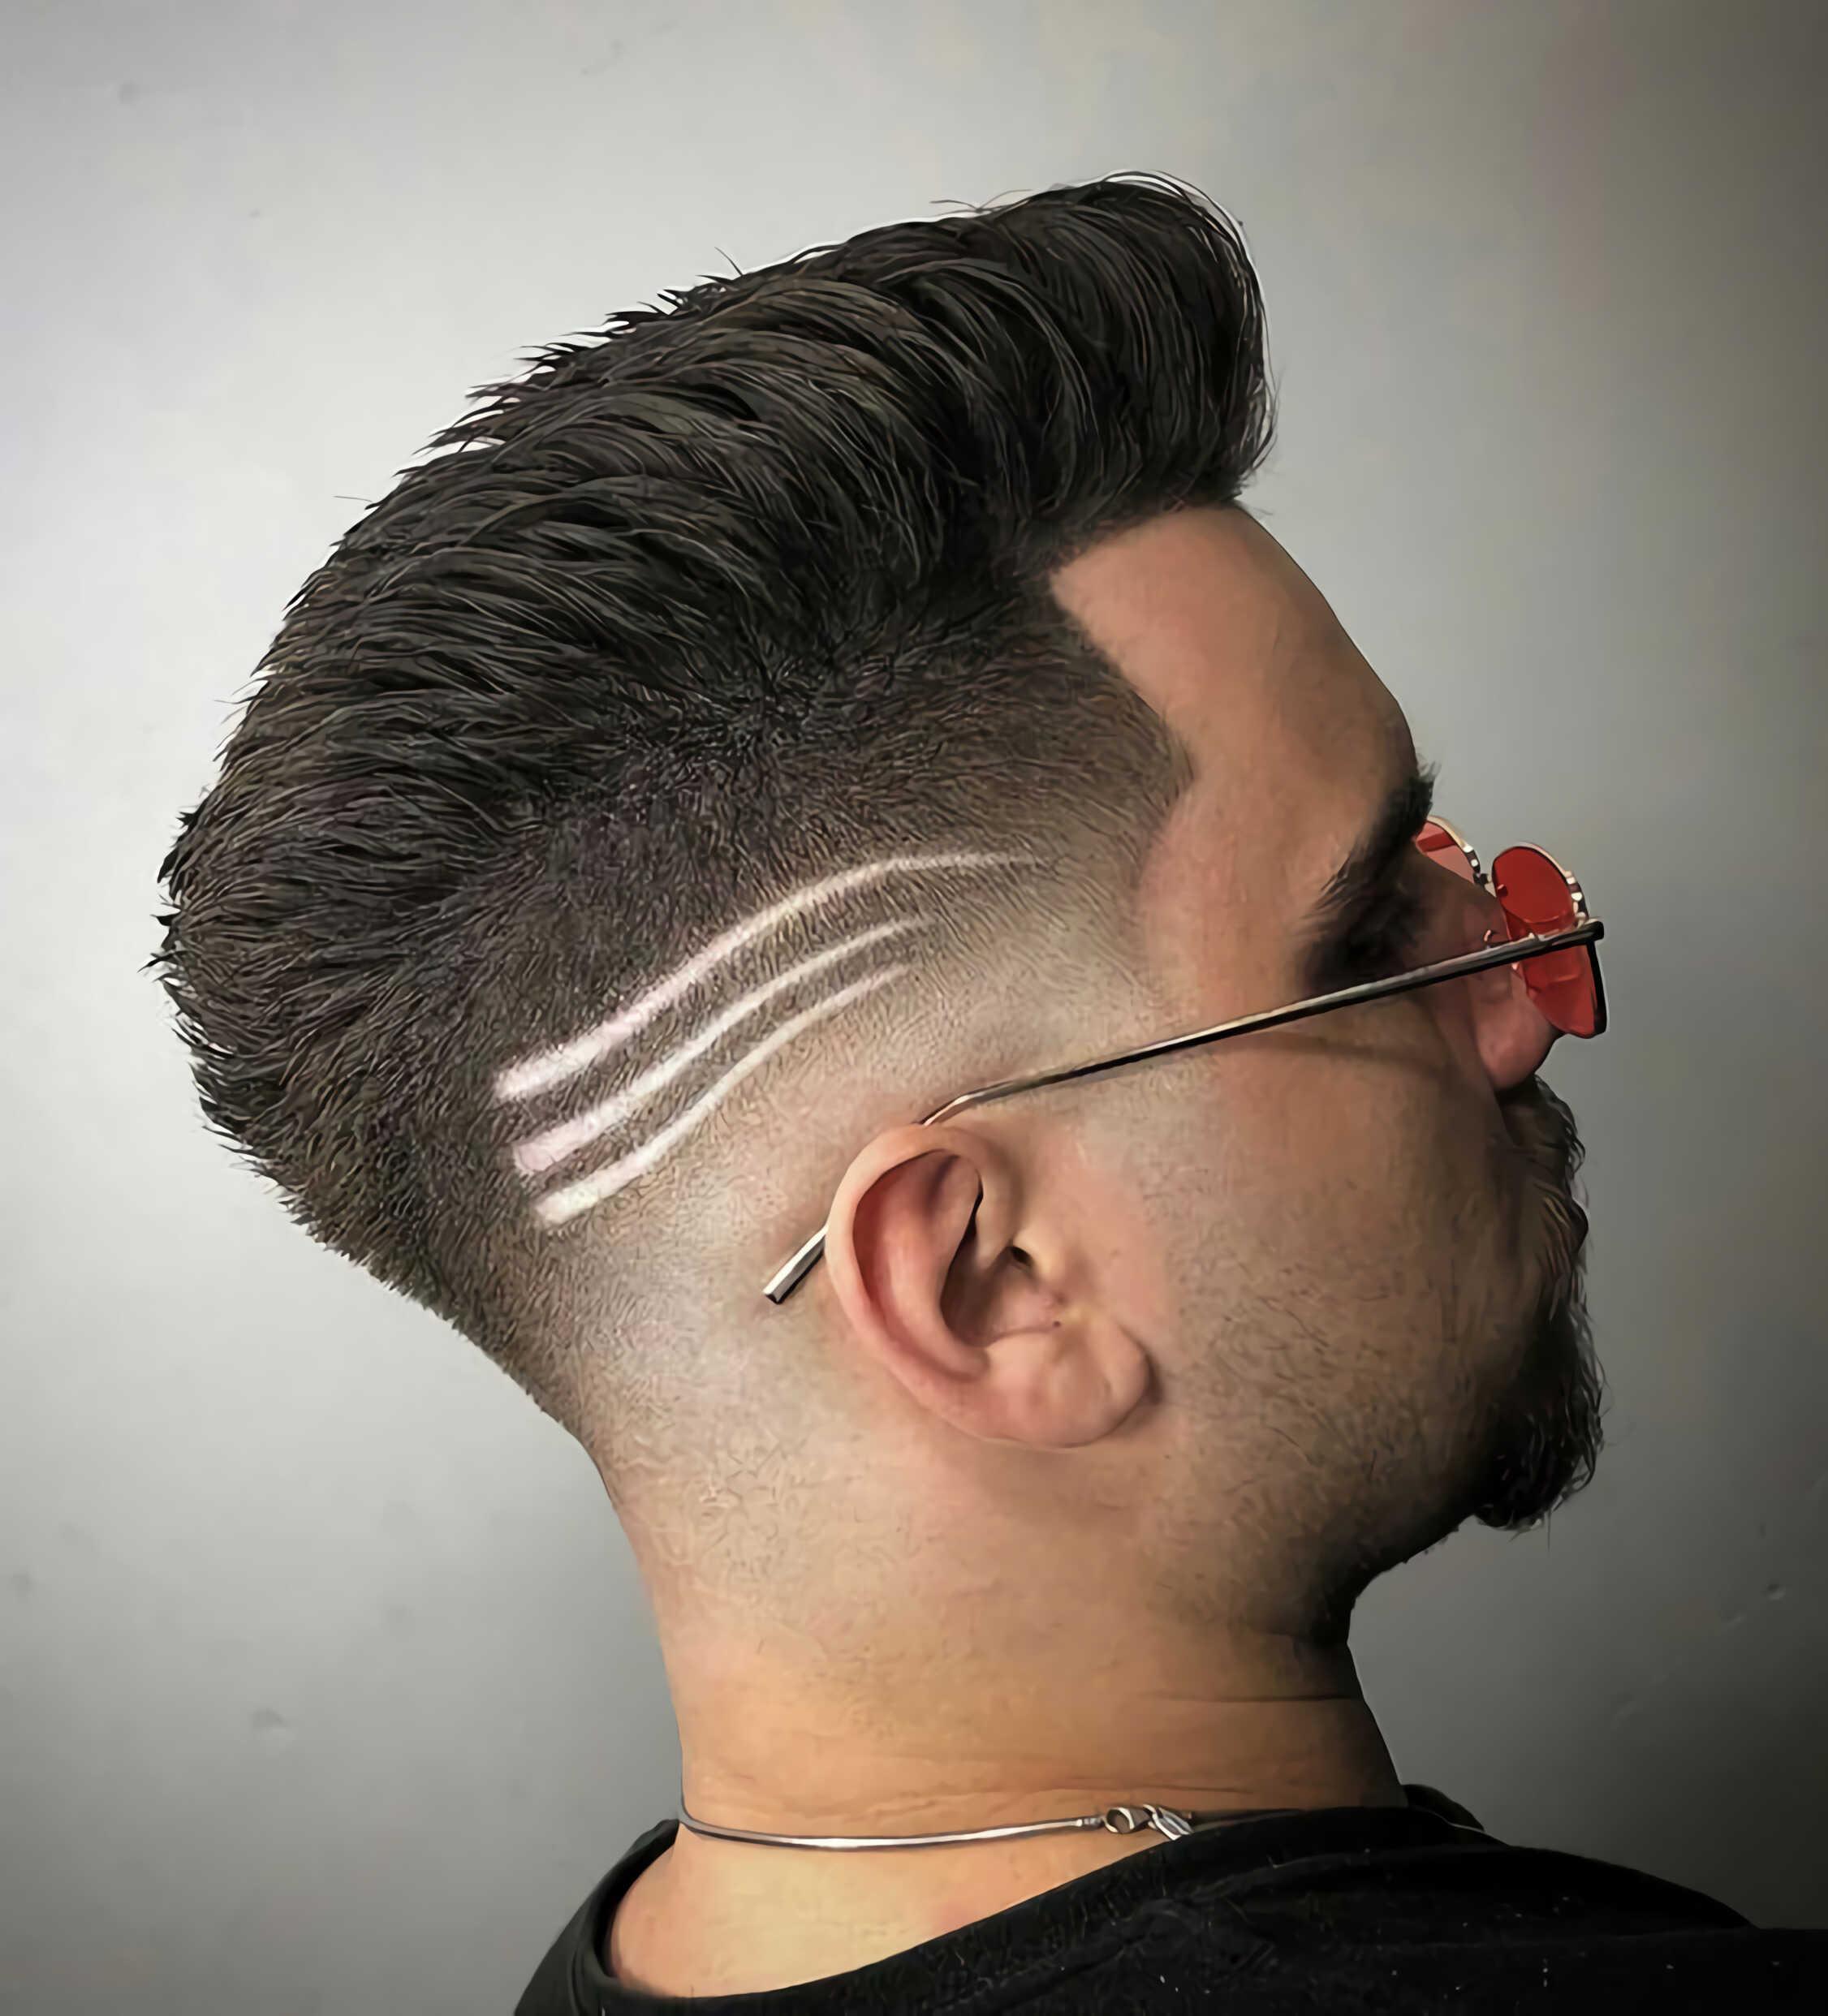 стрижка для мужчин с тремя полосками